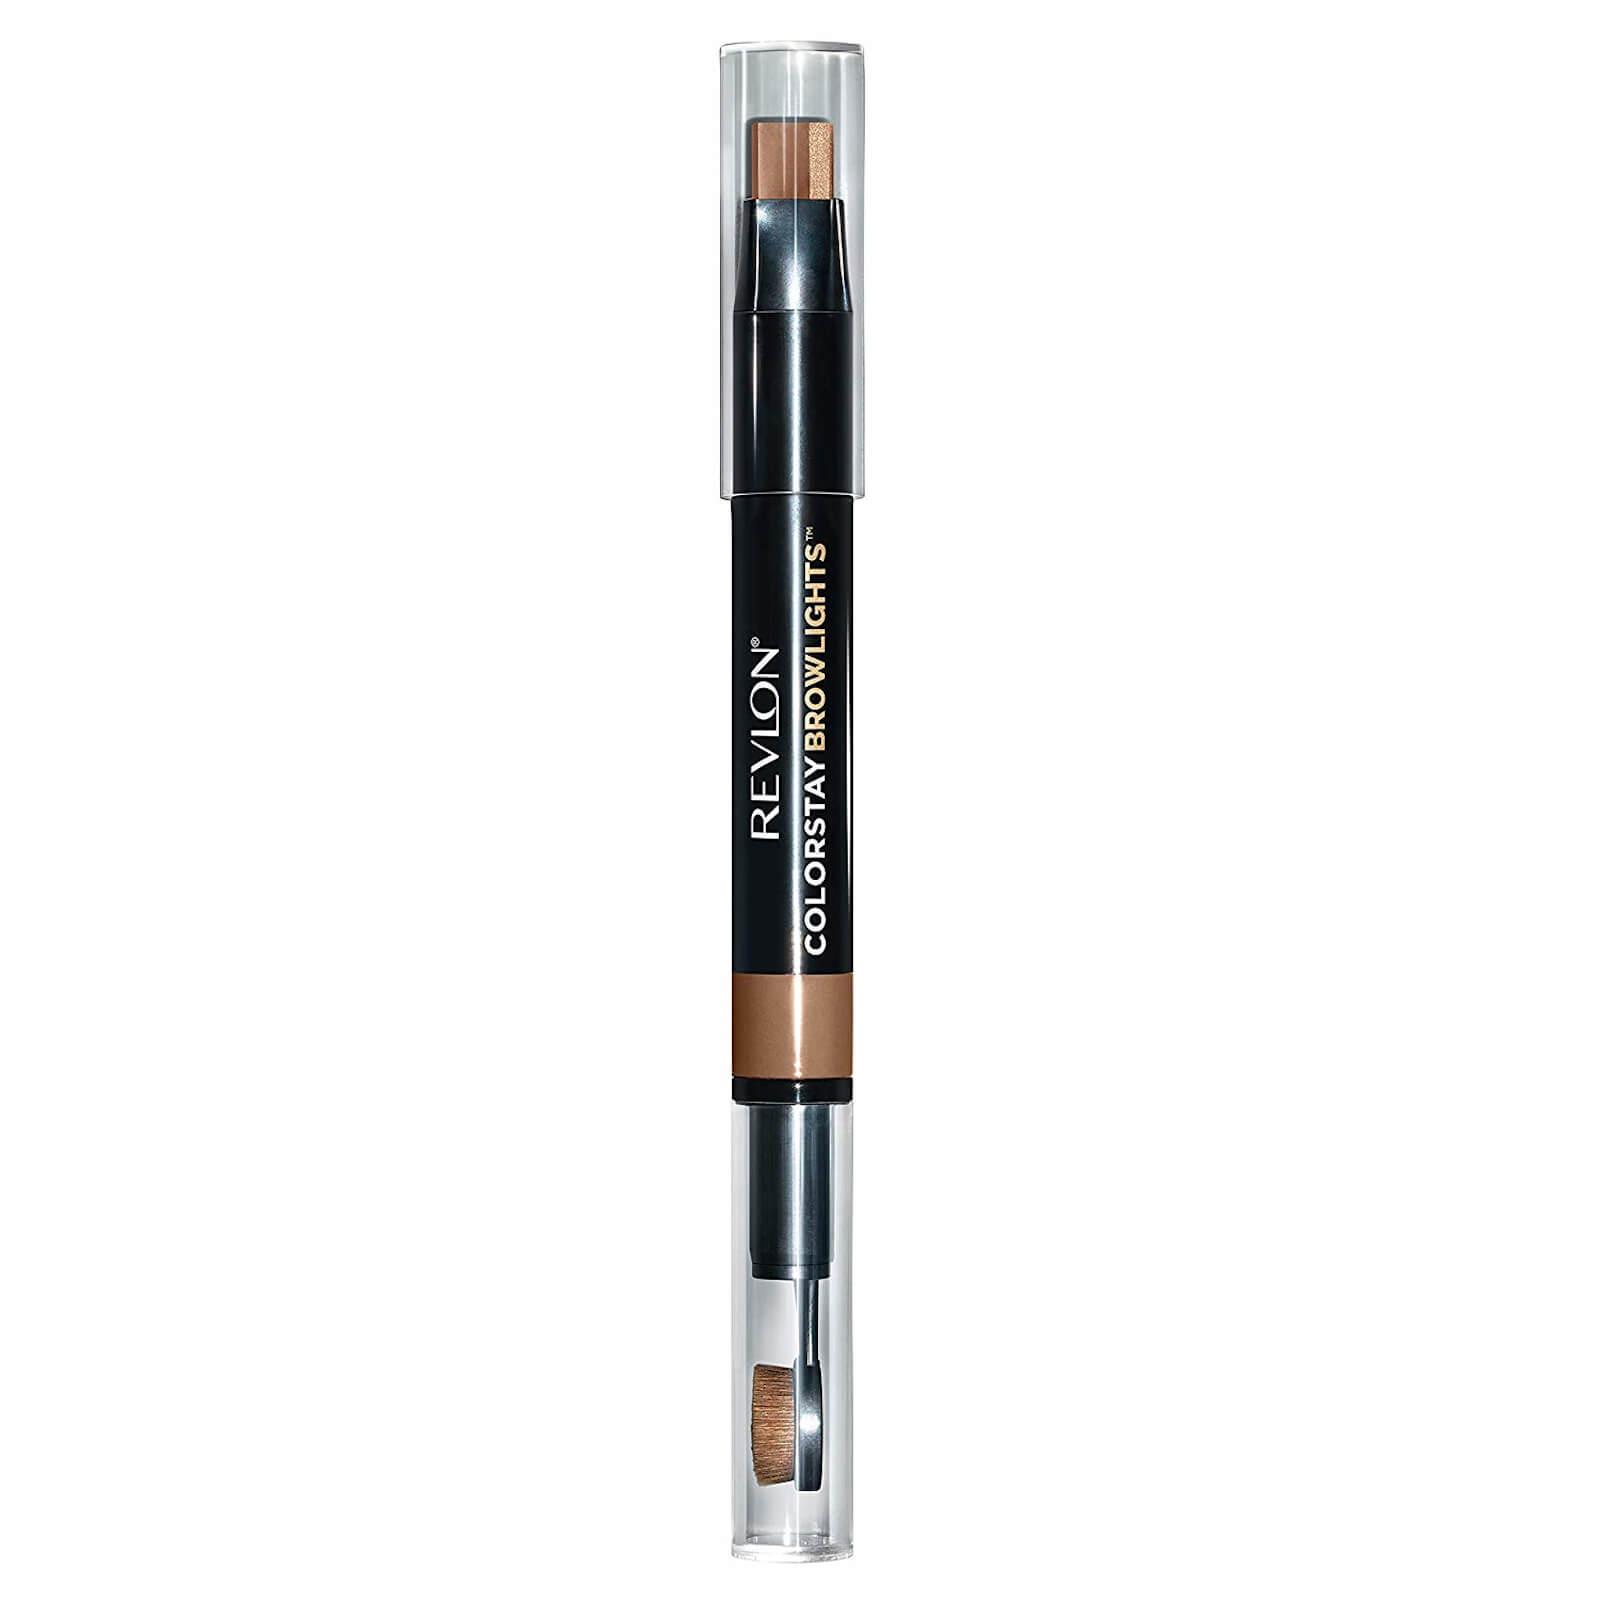 Revlon ColorStay Browlights Pencil 1.1g (Various Shades) - Soft Brown